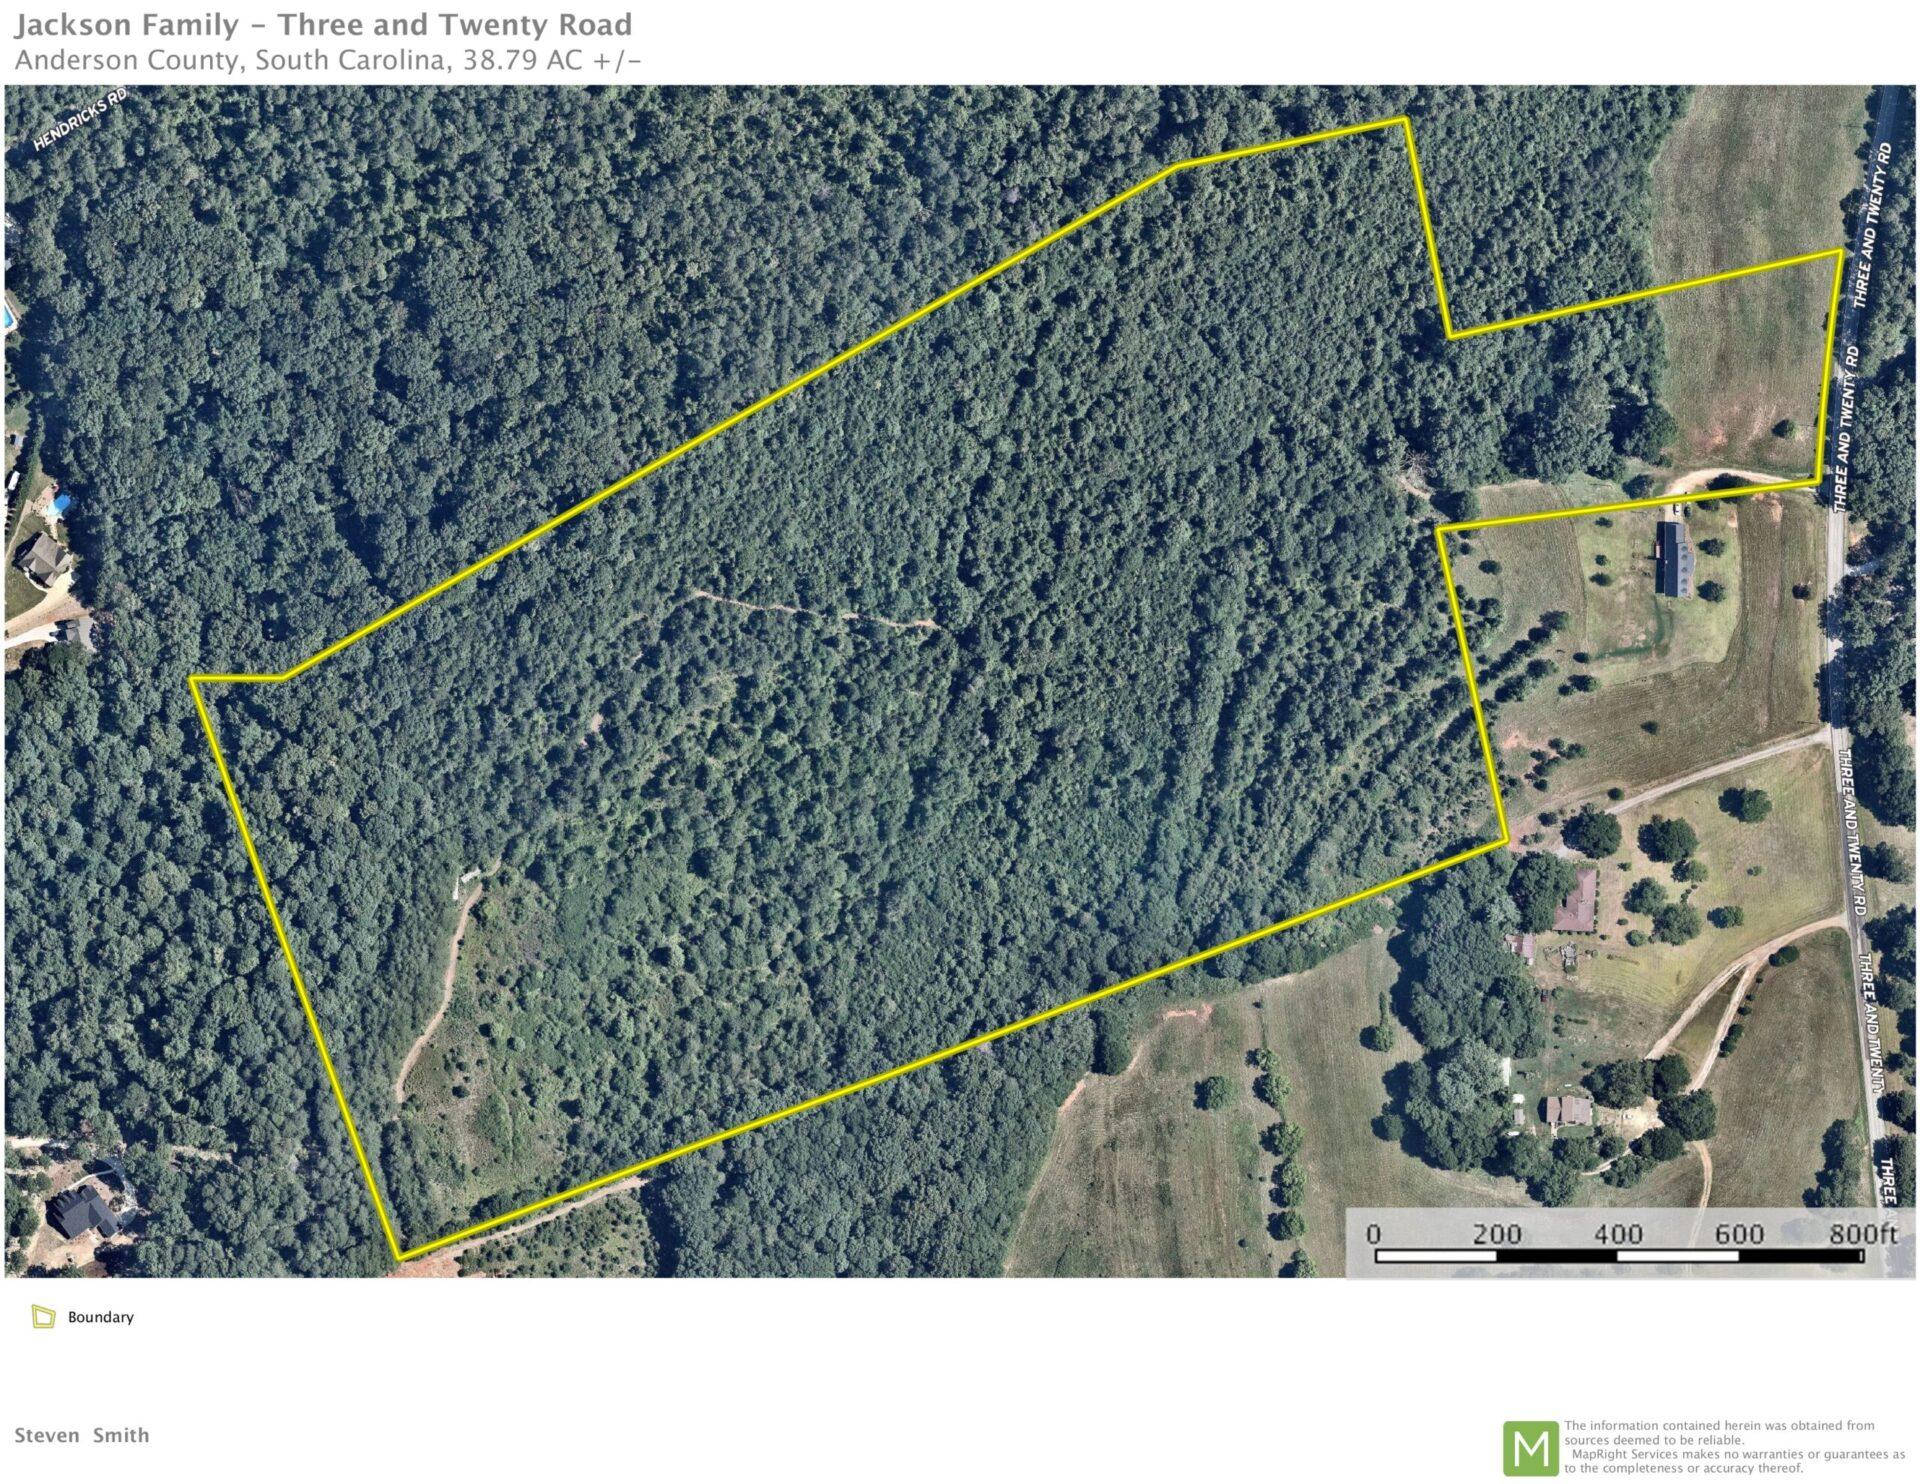 +/-38.79 Acres-Development Opportunity Near Easley, SC*